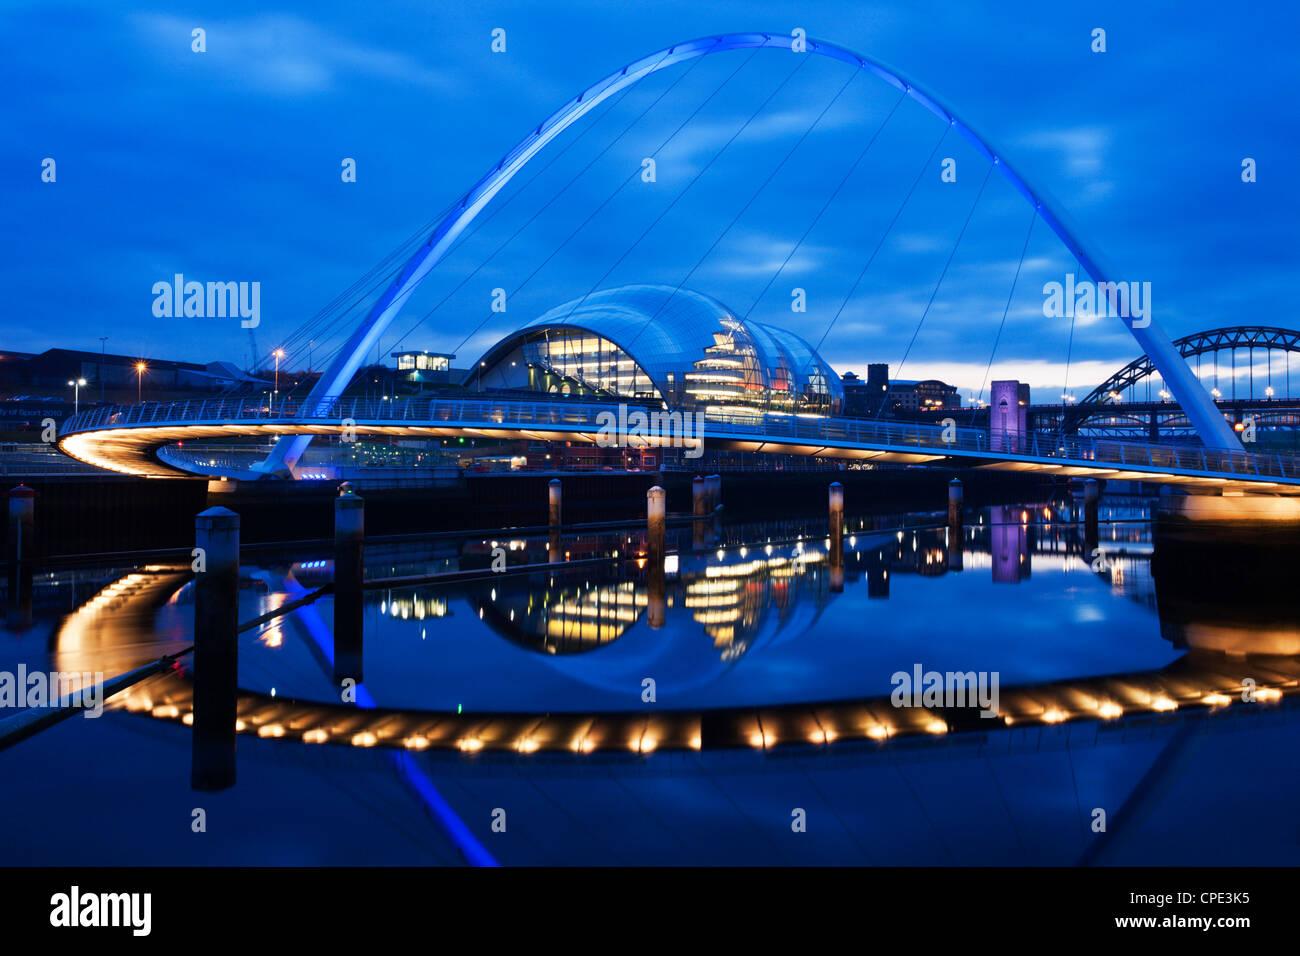 Gateshead Millennium Bridge, la salvia e il fiume Tyne tra Newcastle e Gateshead, al tramonto, Tyne and Wear, England, Foto Stock